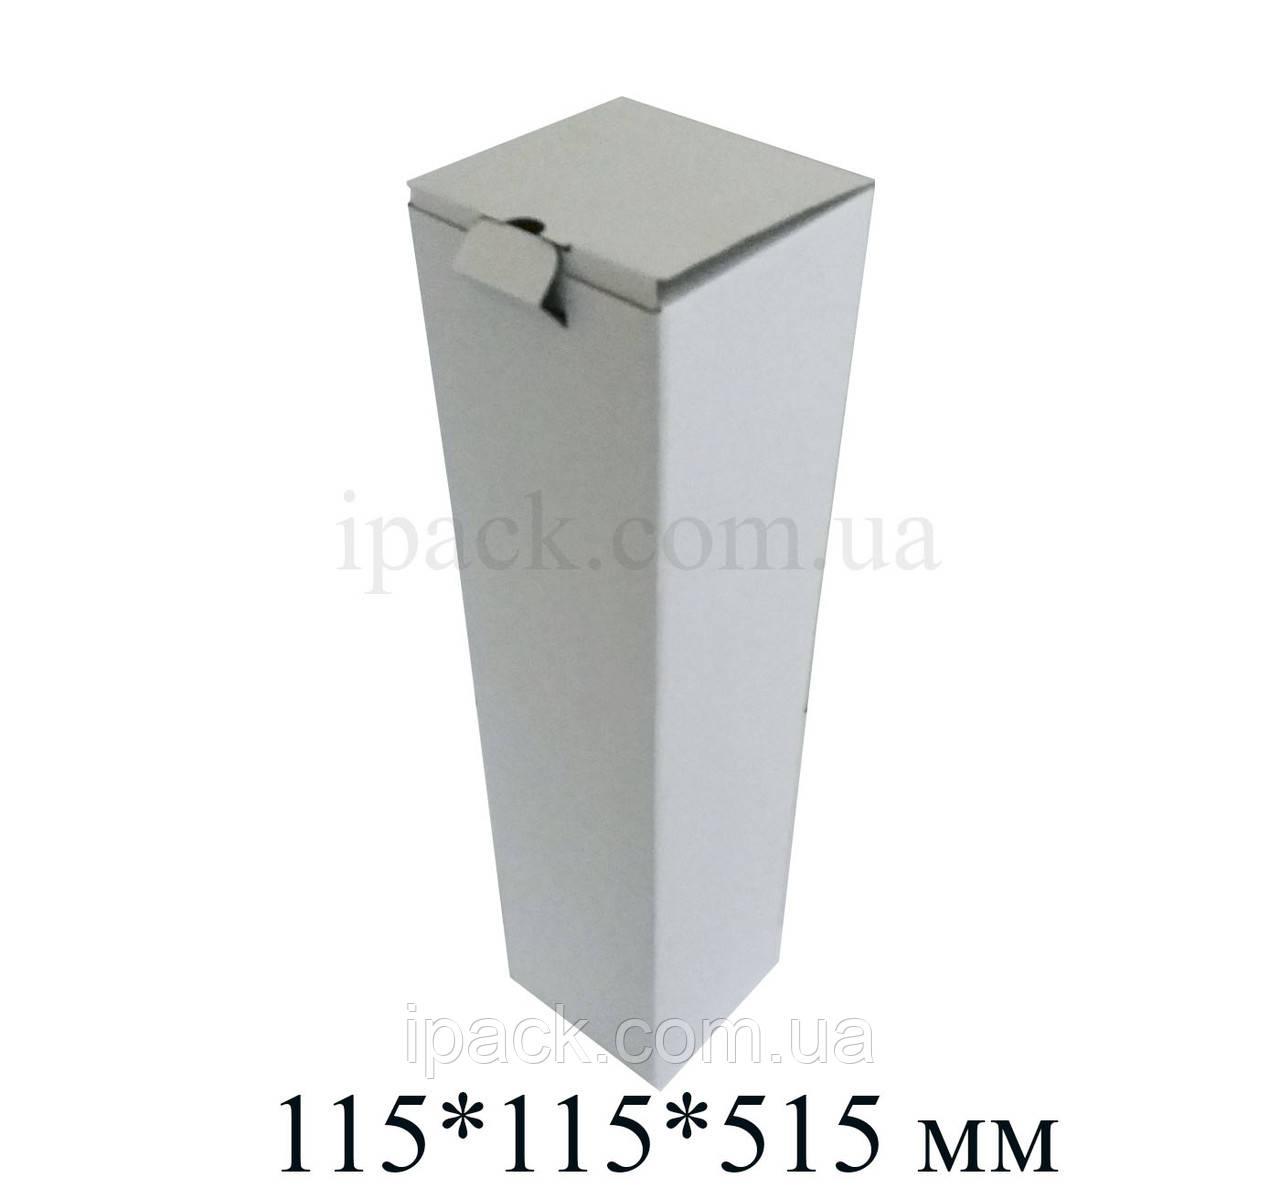 Коробка картонная самосборная, 115*115*515, мм, белая, микрогофрокартон